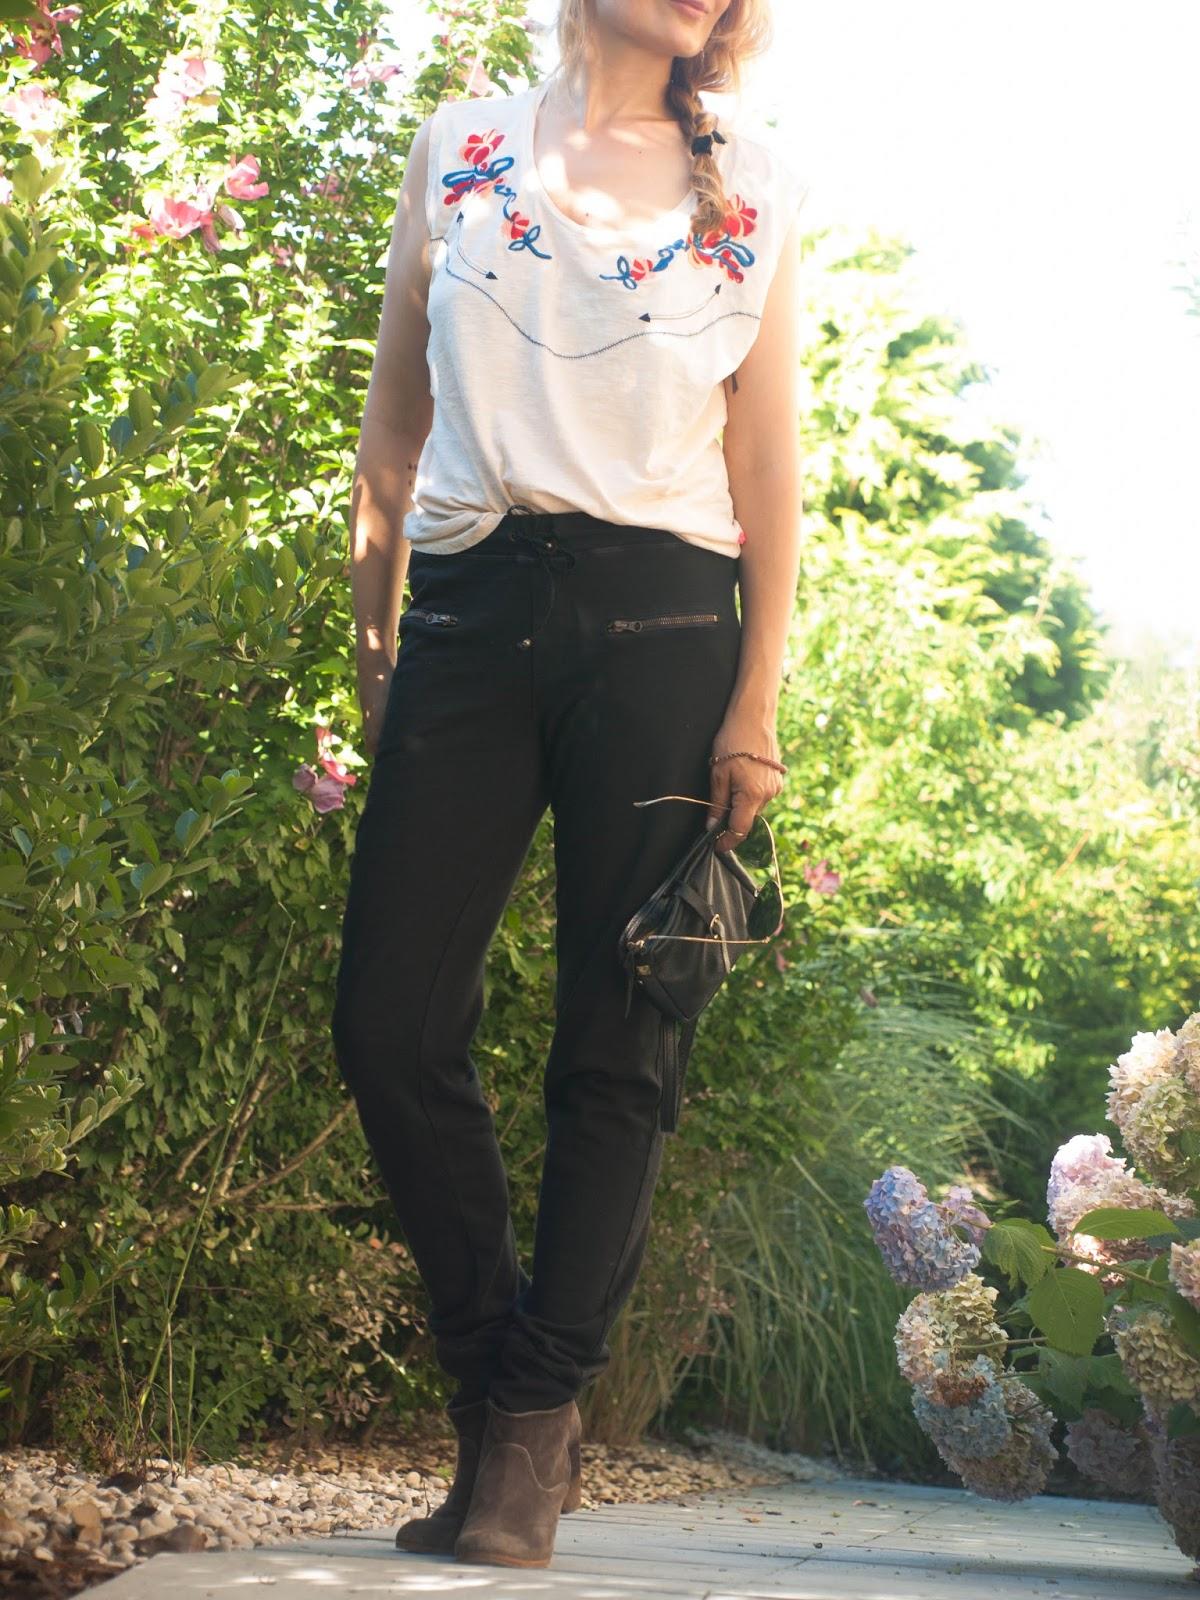 Rag doll, ragdoll LA, track pamnts, Kate bosworth, Rosie HW, Leon and Harper, Western shirt, Comptoir des Cottoniers